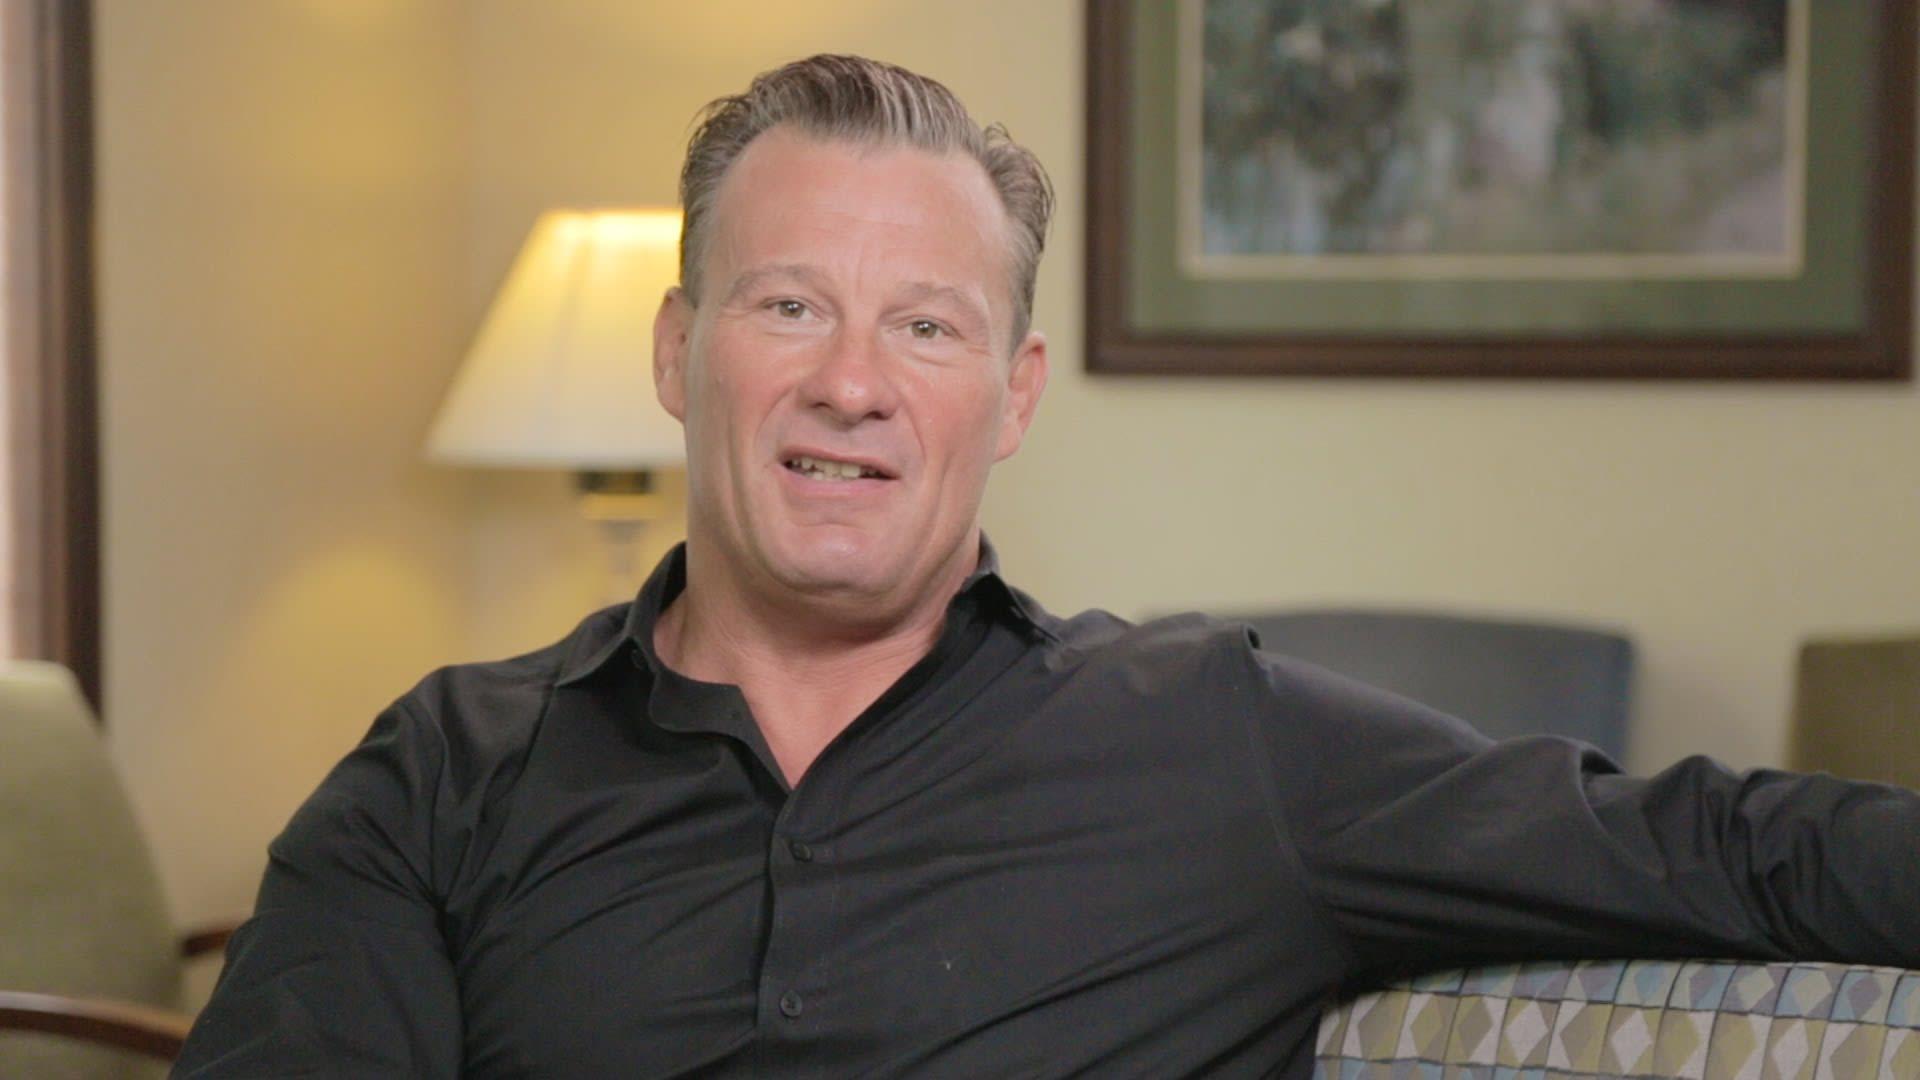 David Had a Bone Graft and Dental Implants